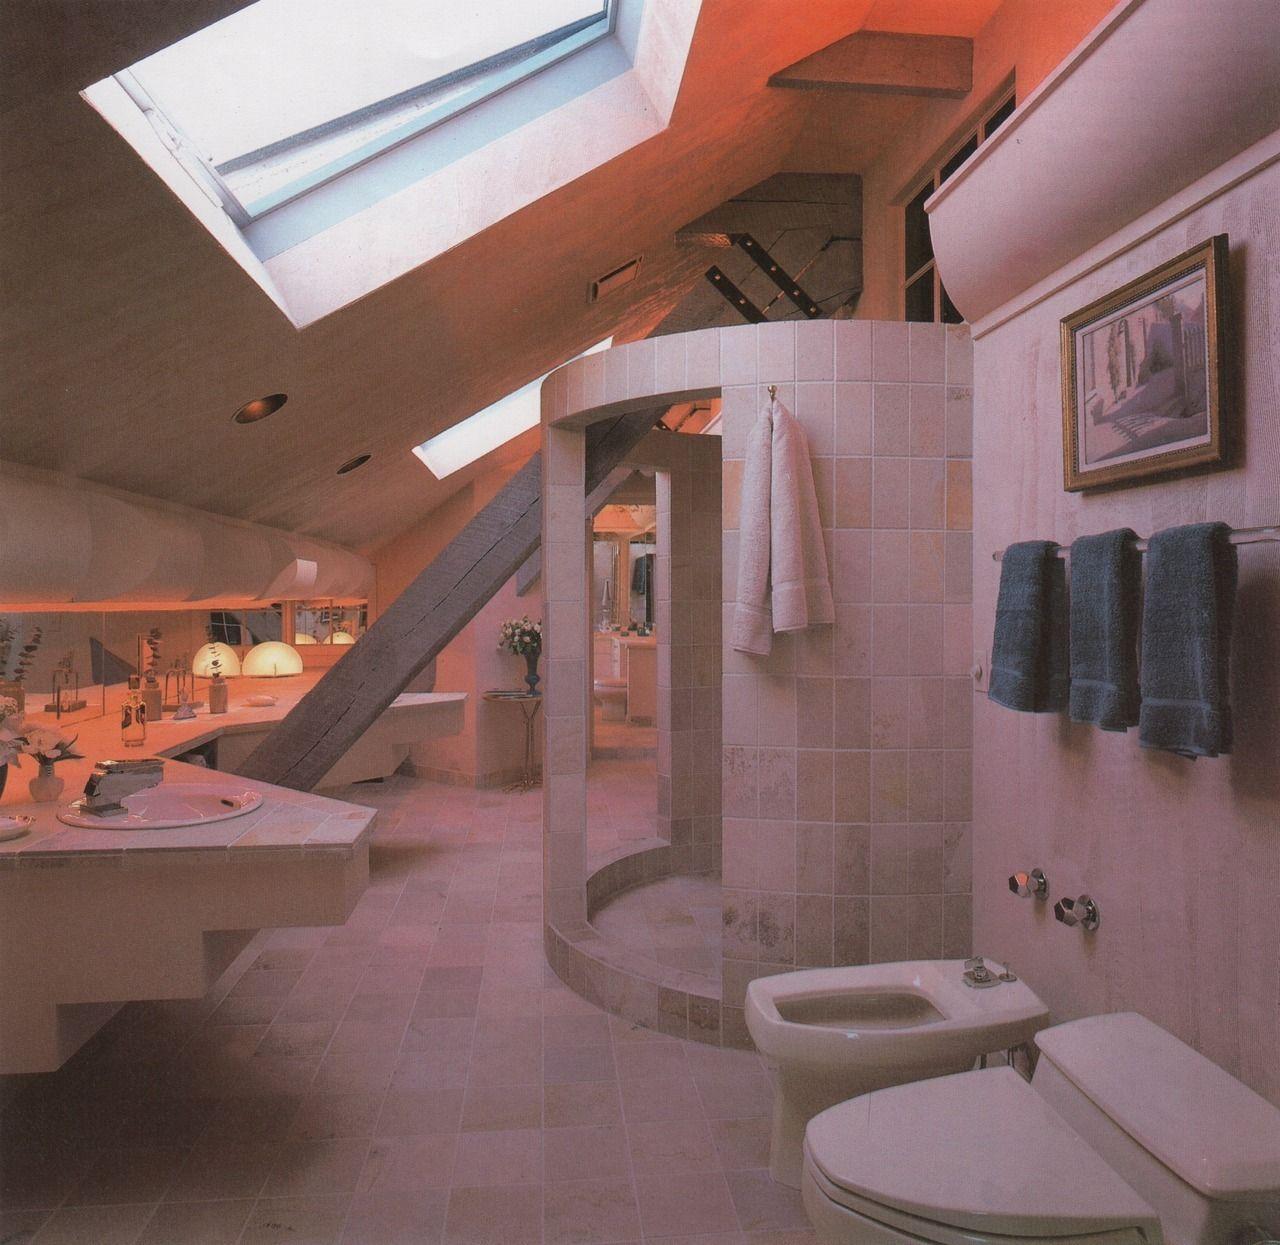 Mondo80s90spictorama Palmandlaser From Bath Design 1986 Got A Real Total Recall Vib Bathroom Interior Design Retro Interior Design Top Bathroom Design